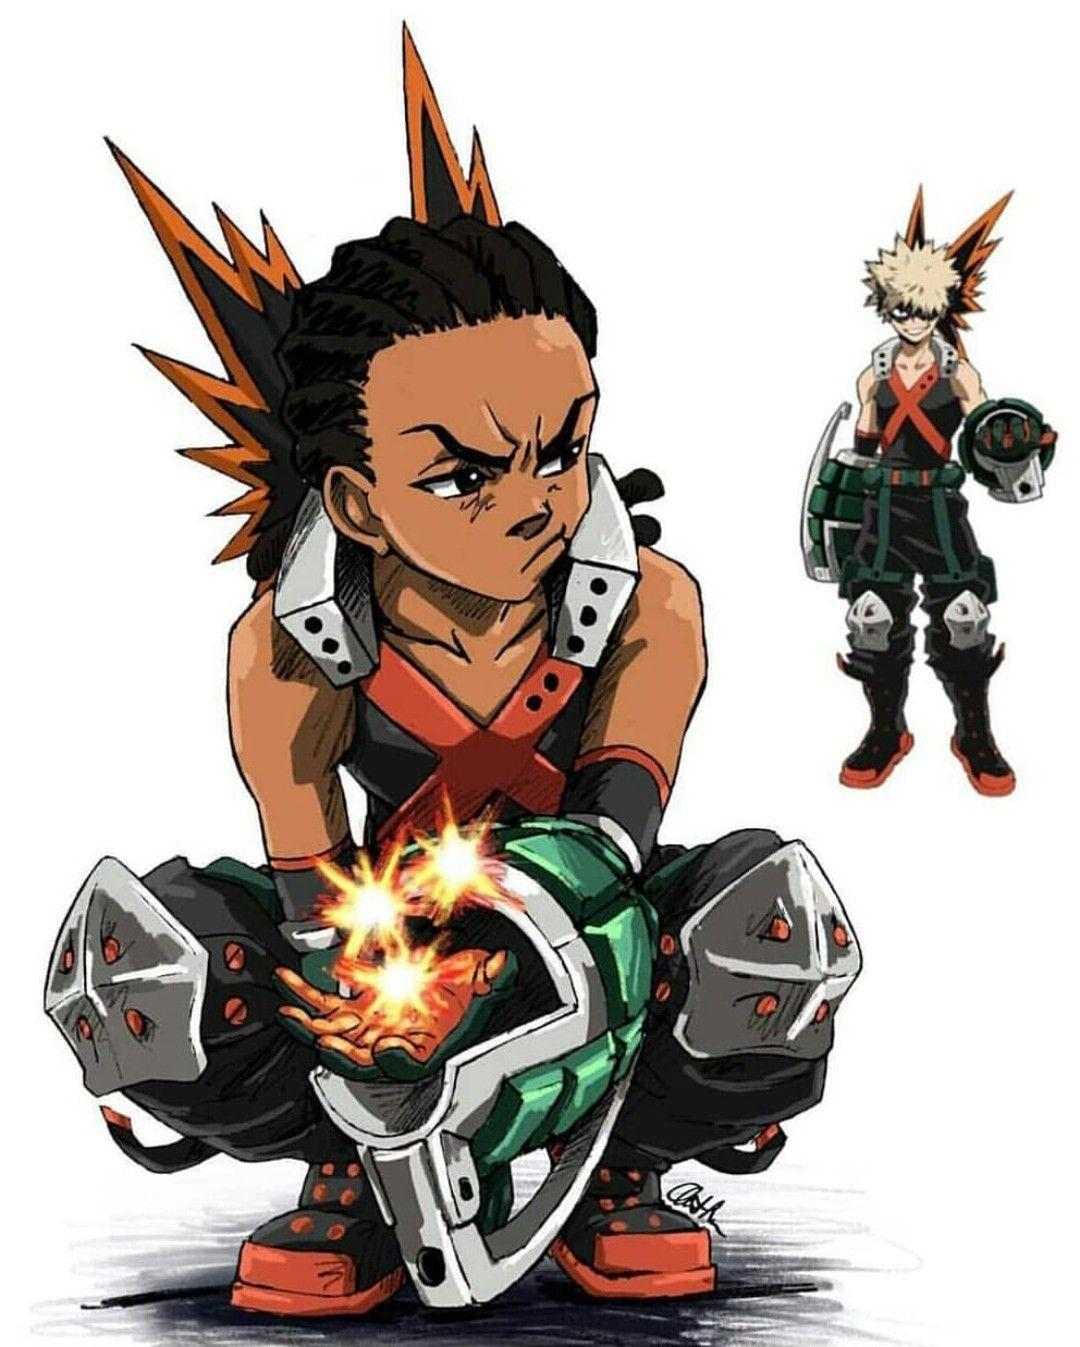 My Hero Academia Boondocks Black anime characters